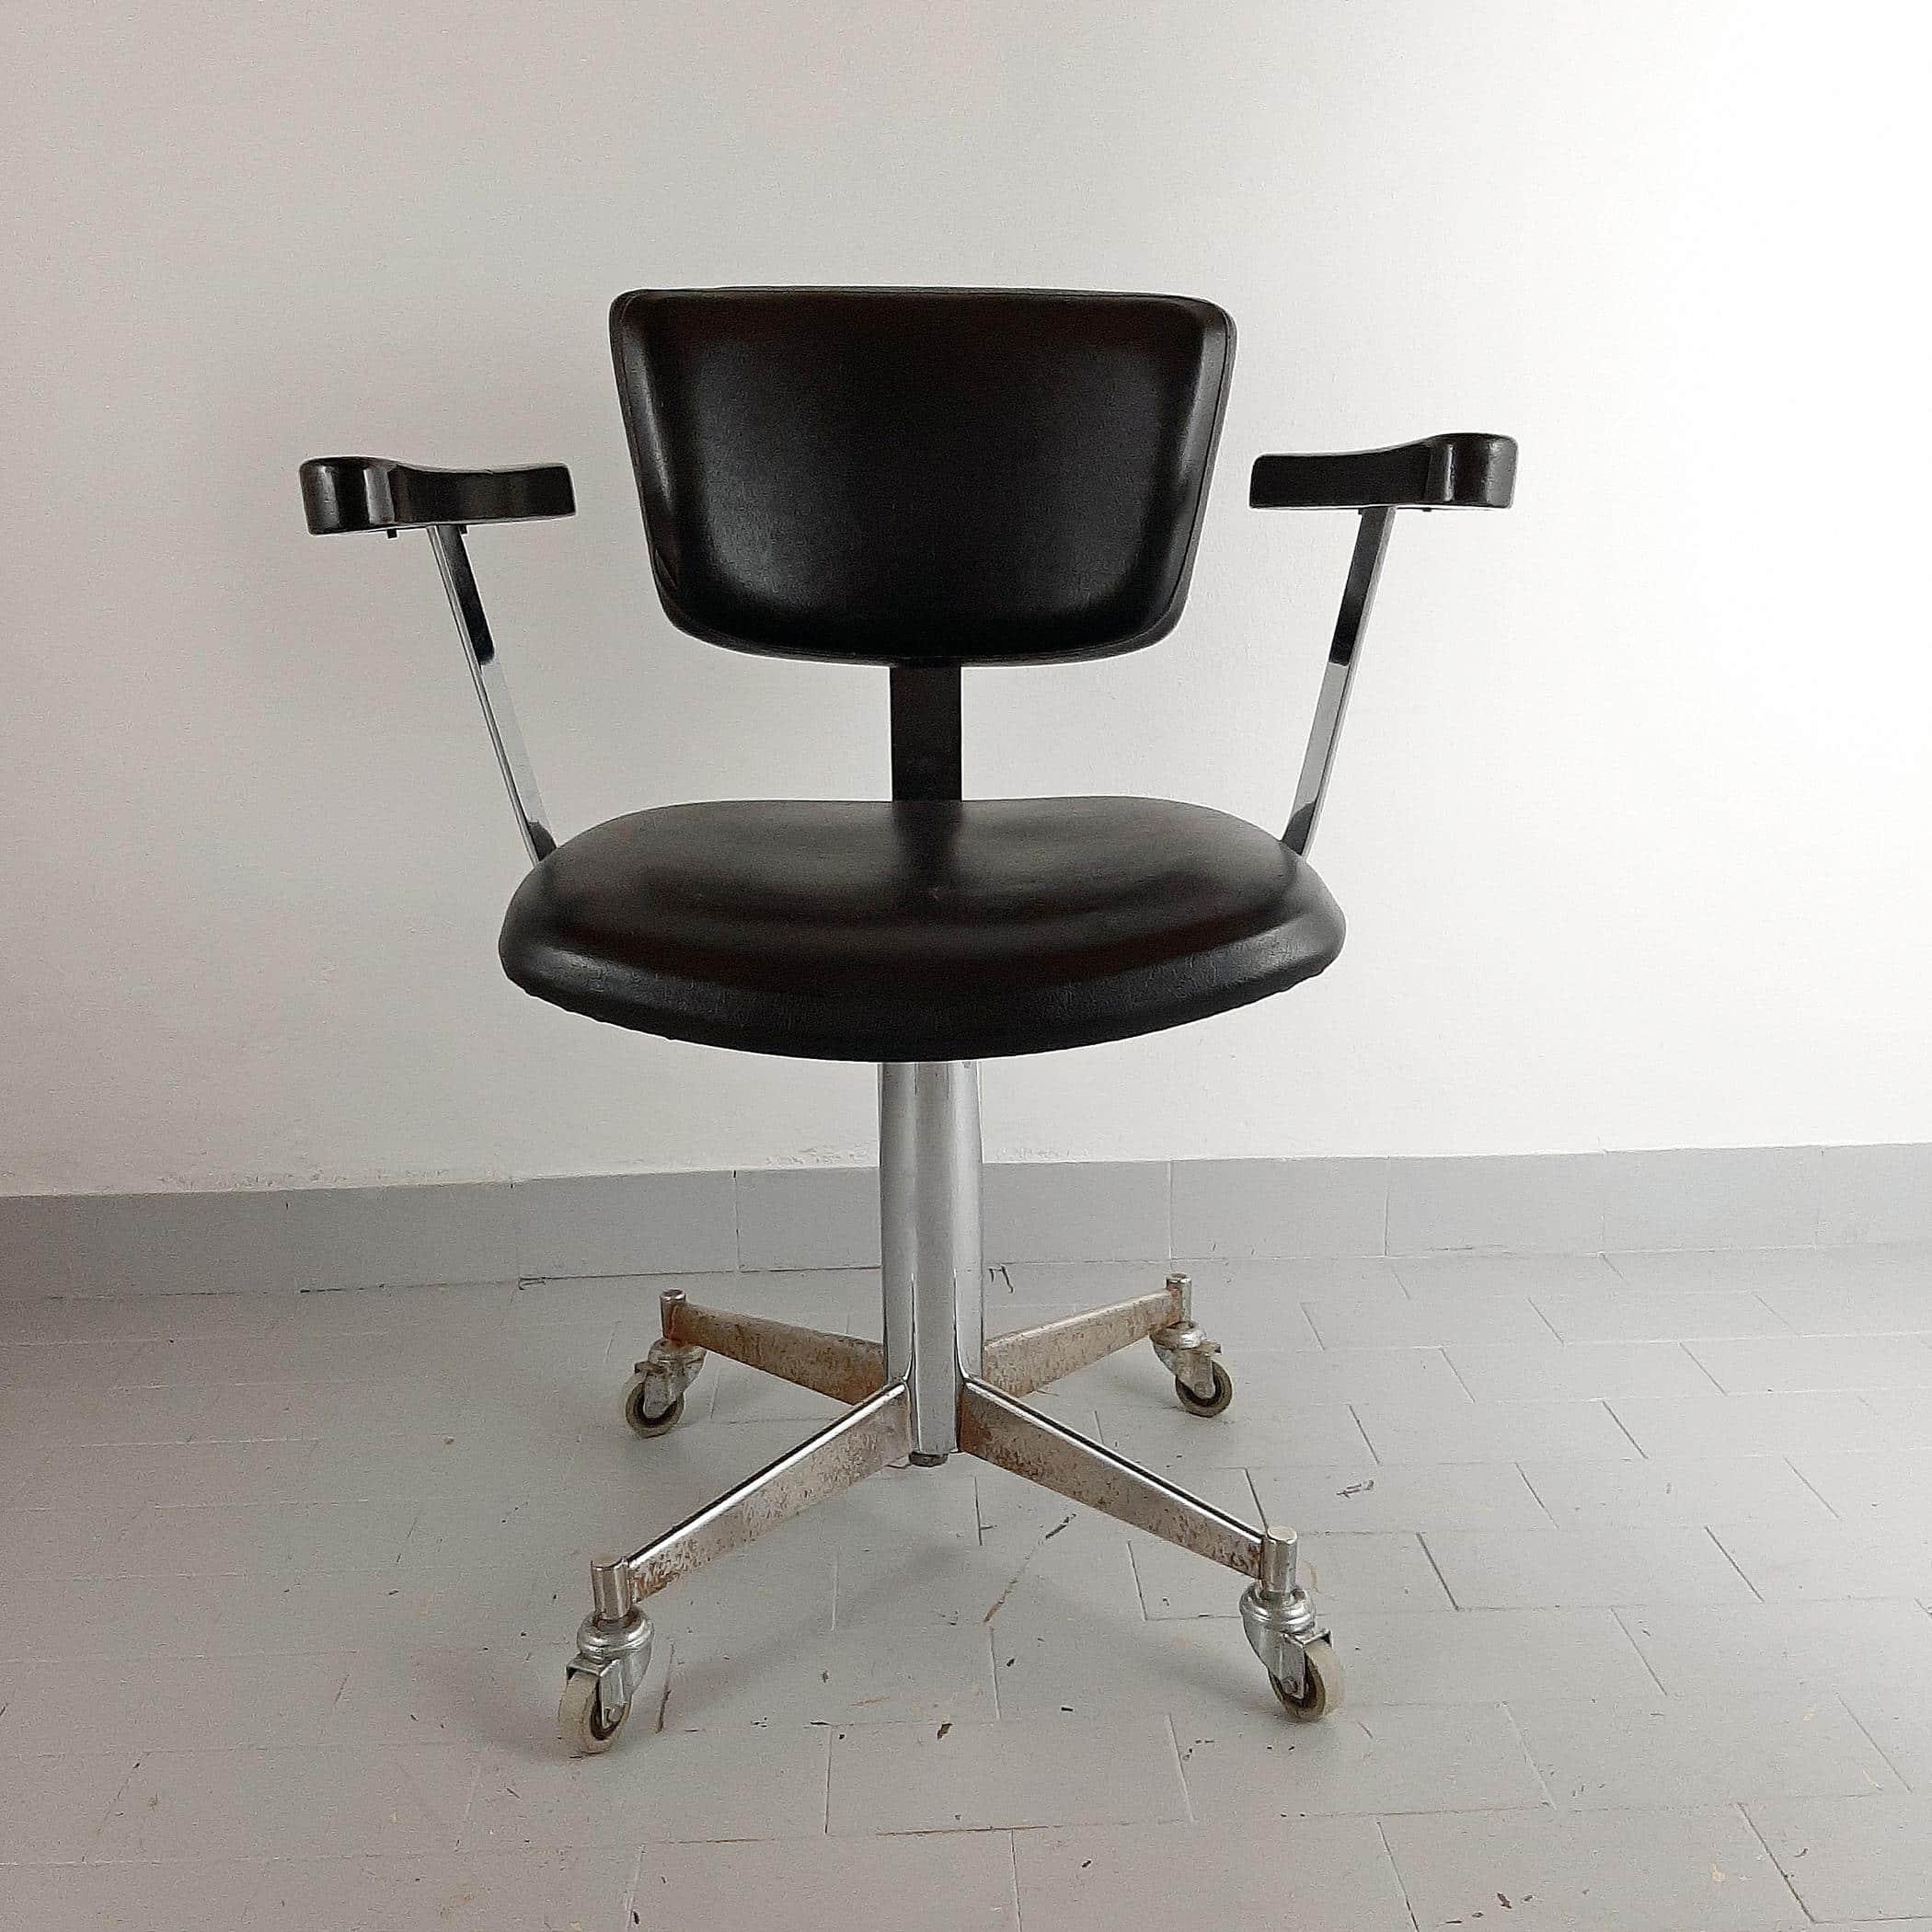 Retro black barber chair 50s Vintage Hairdresser chair Hair salon chair Office chair Desk chair Rolling chair